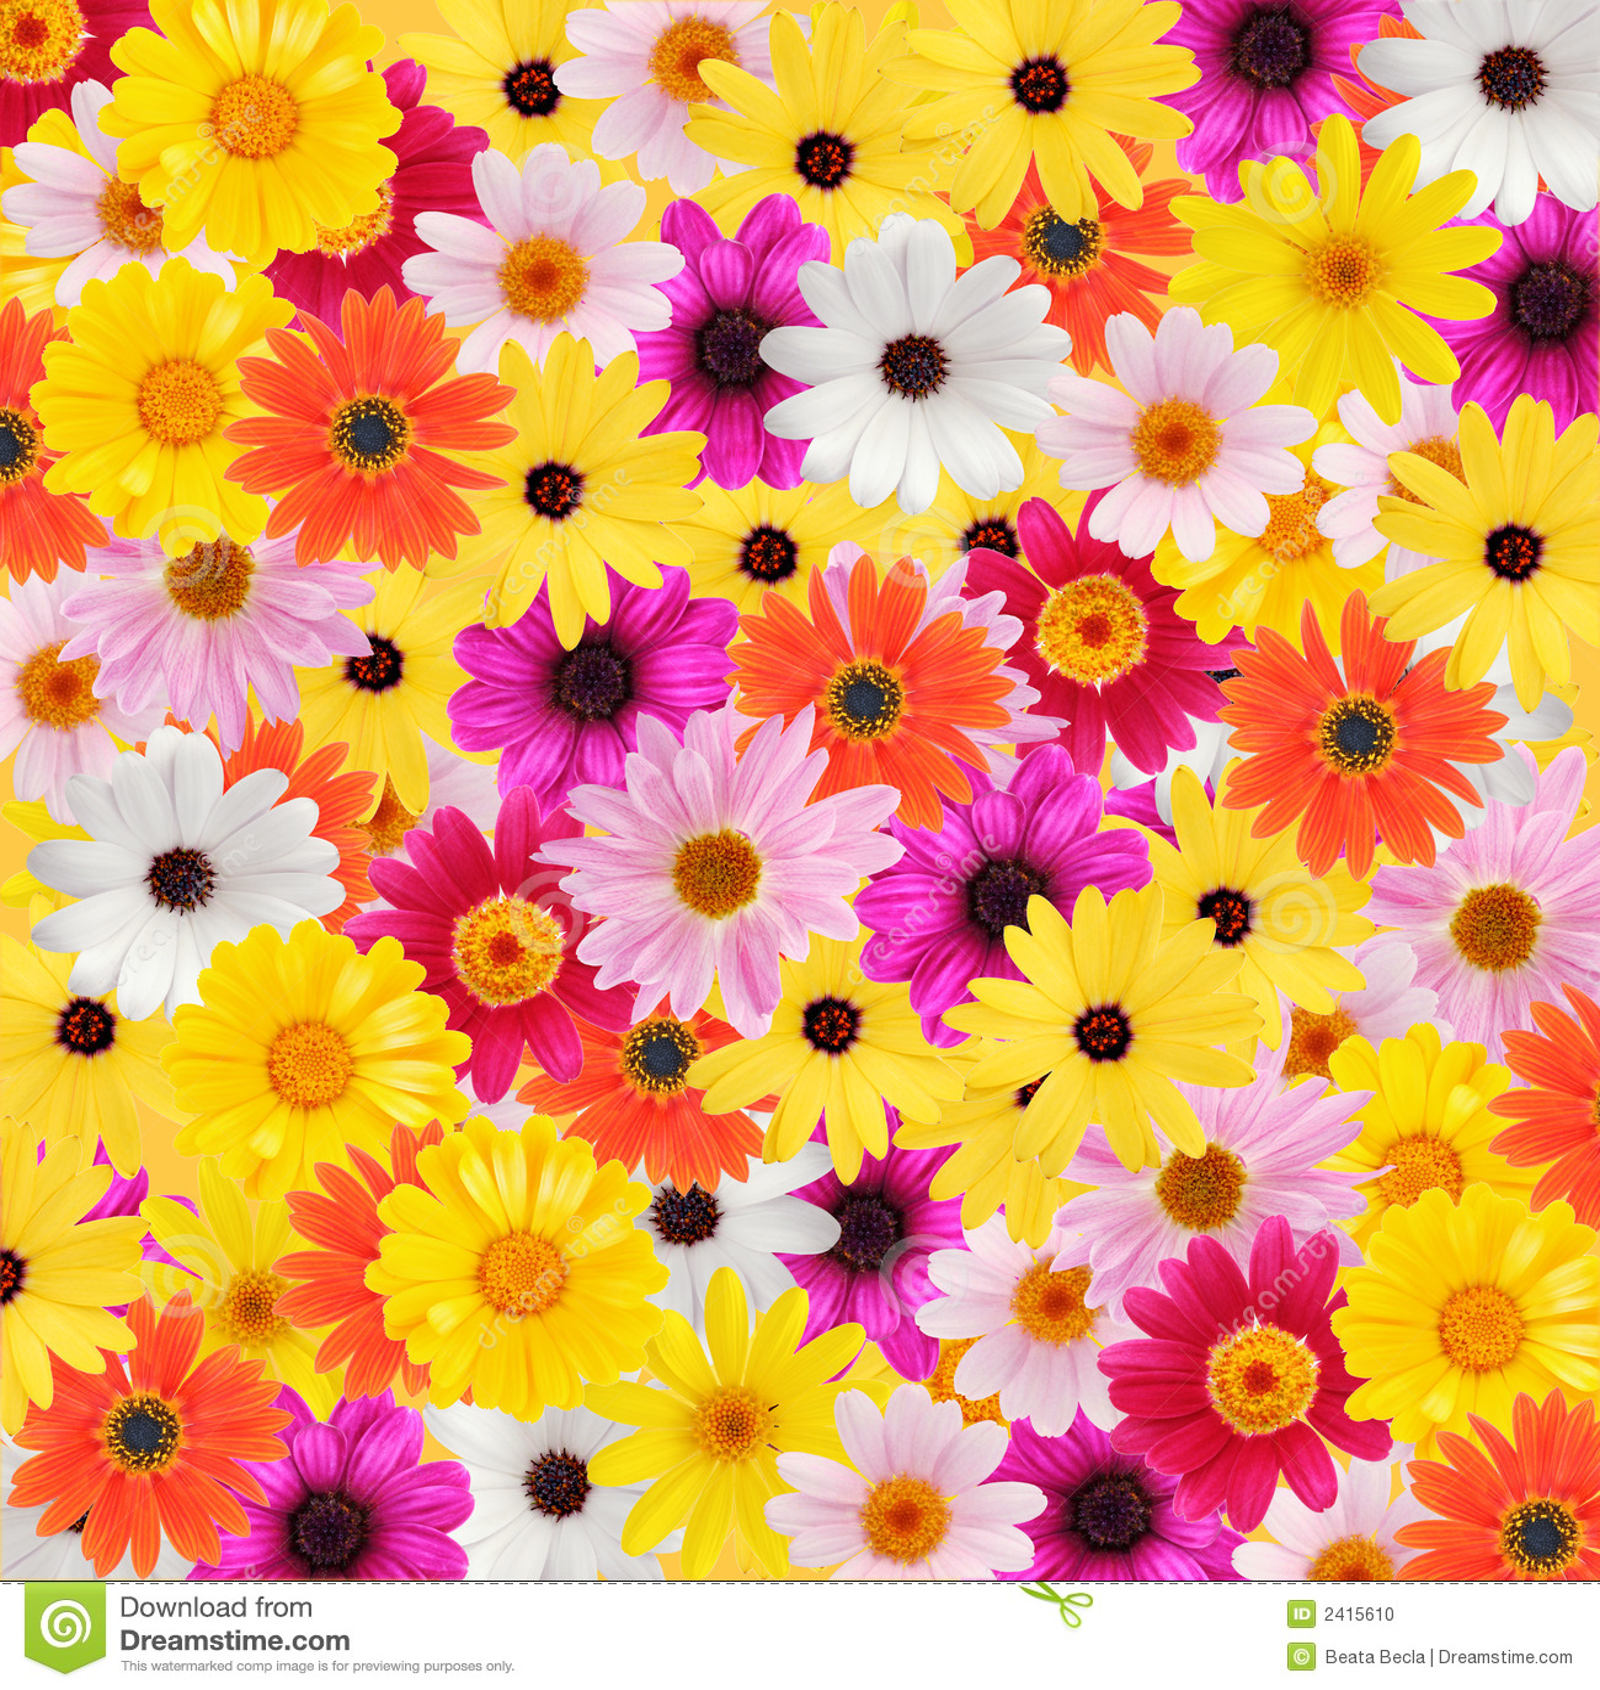 Colorful Daisy Background Stock Photo. Image Of Purple